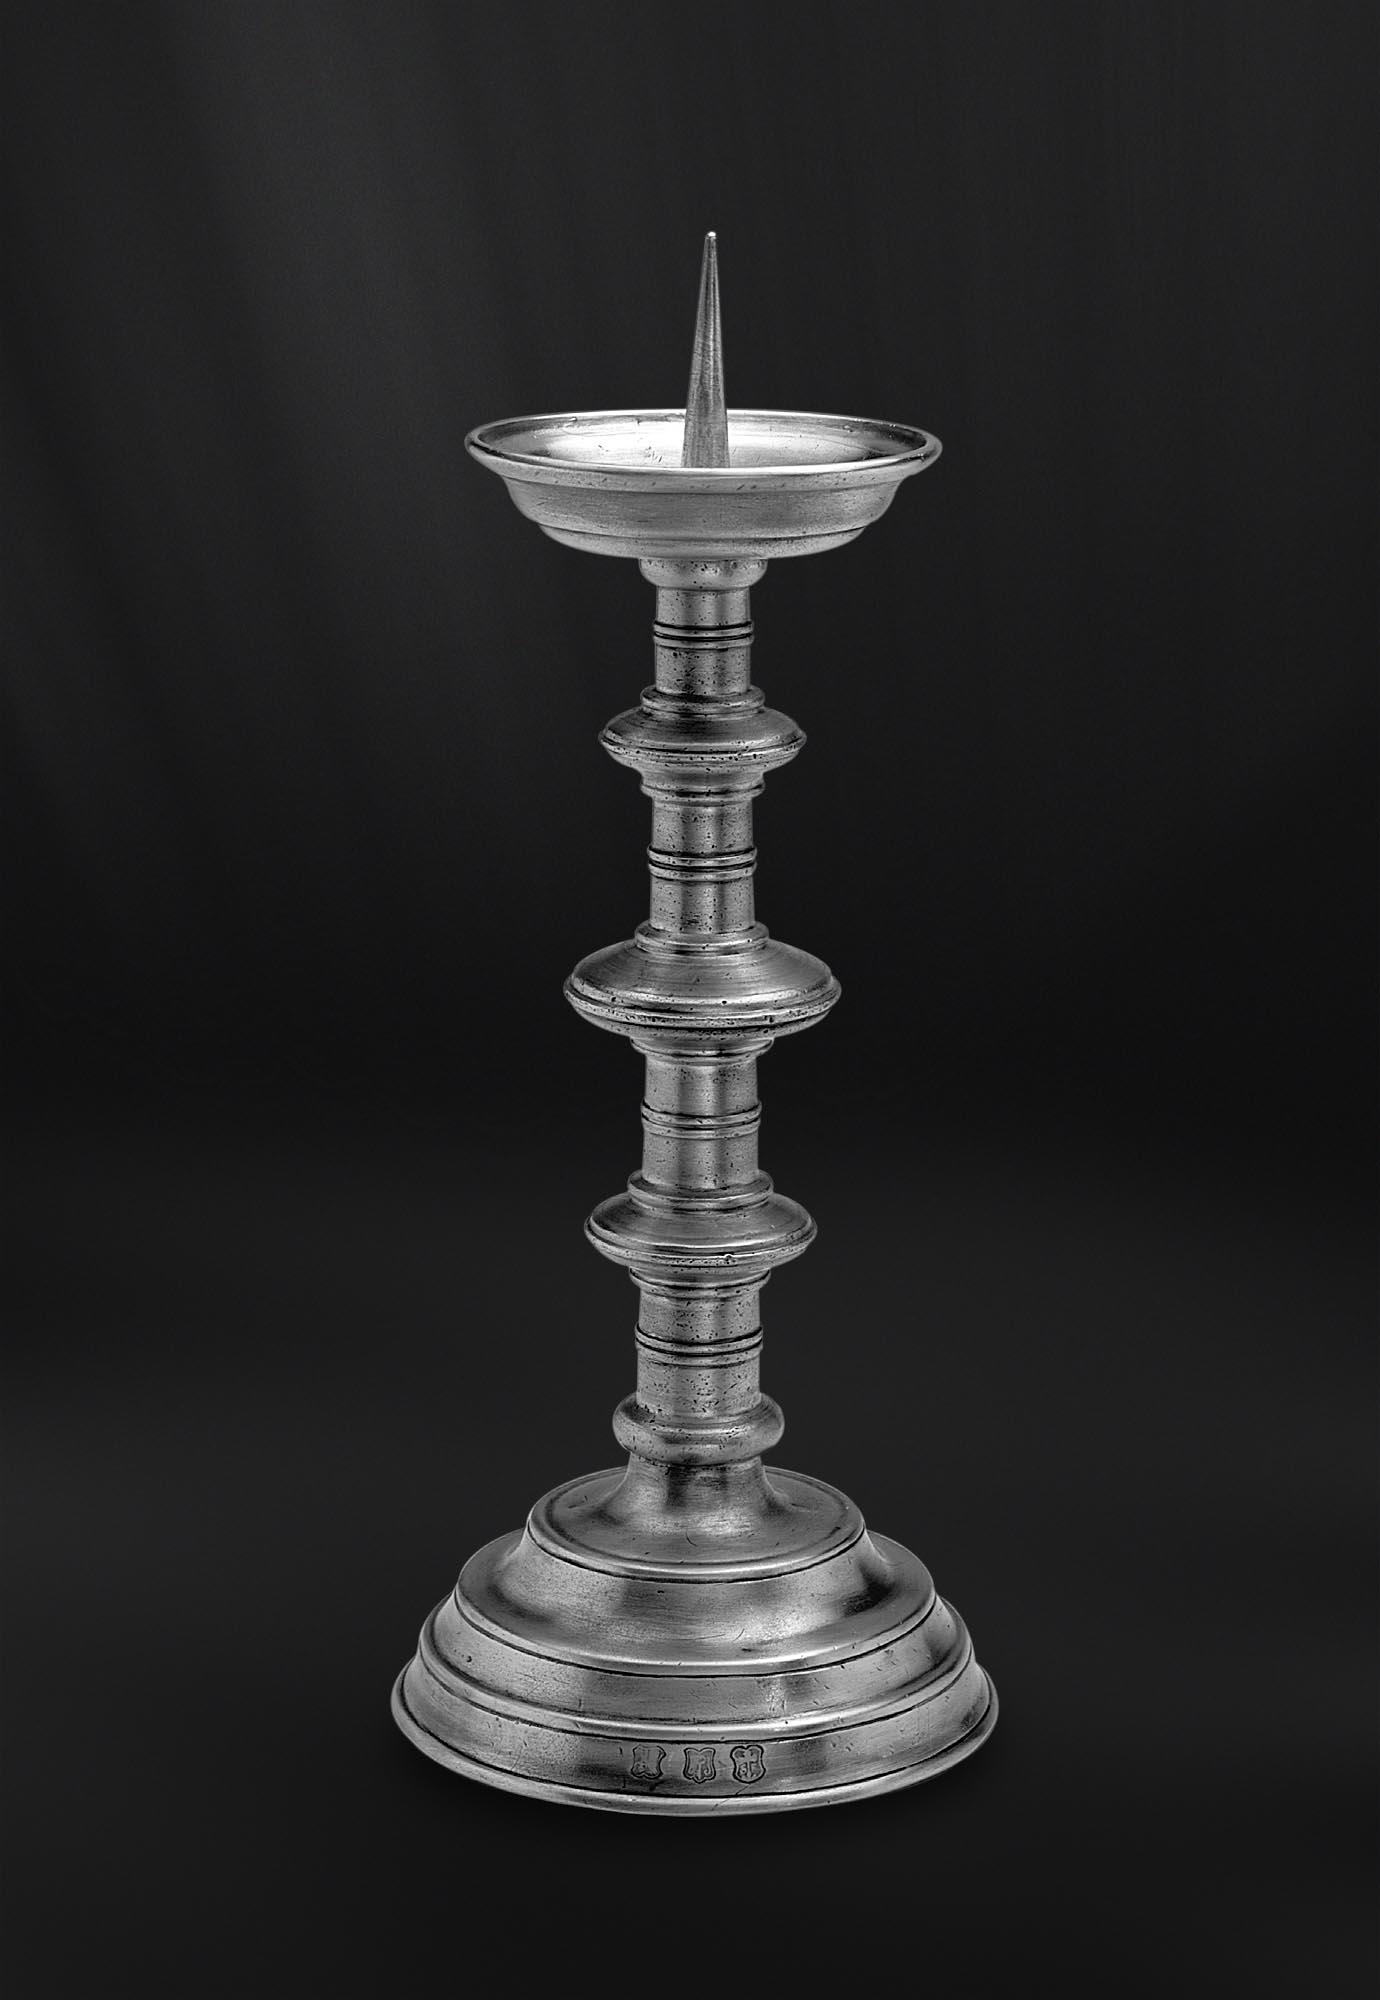 PIQUE CIERGE etain antique